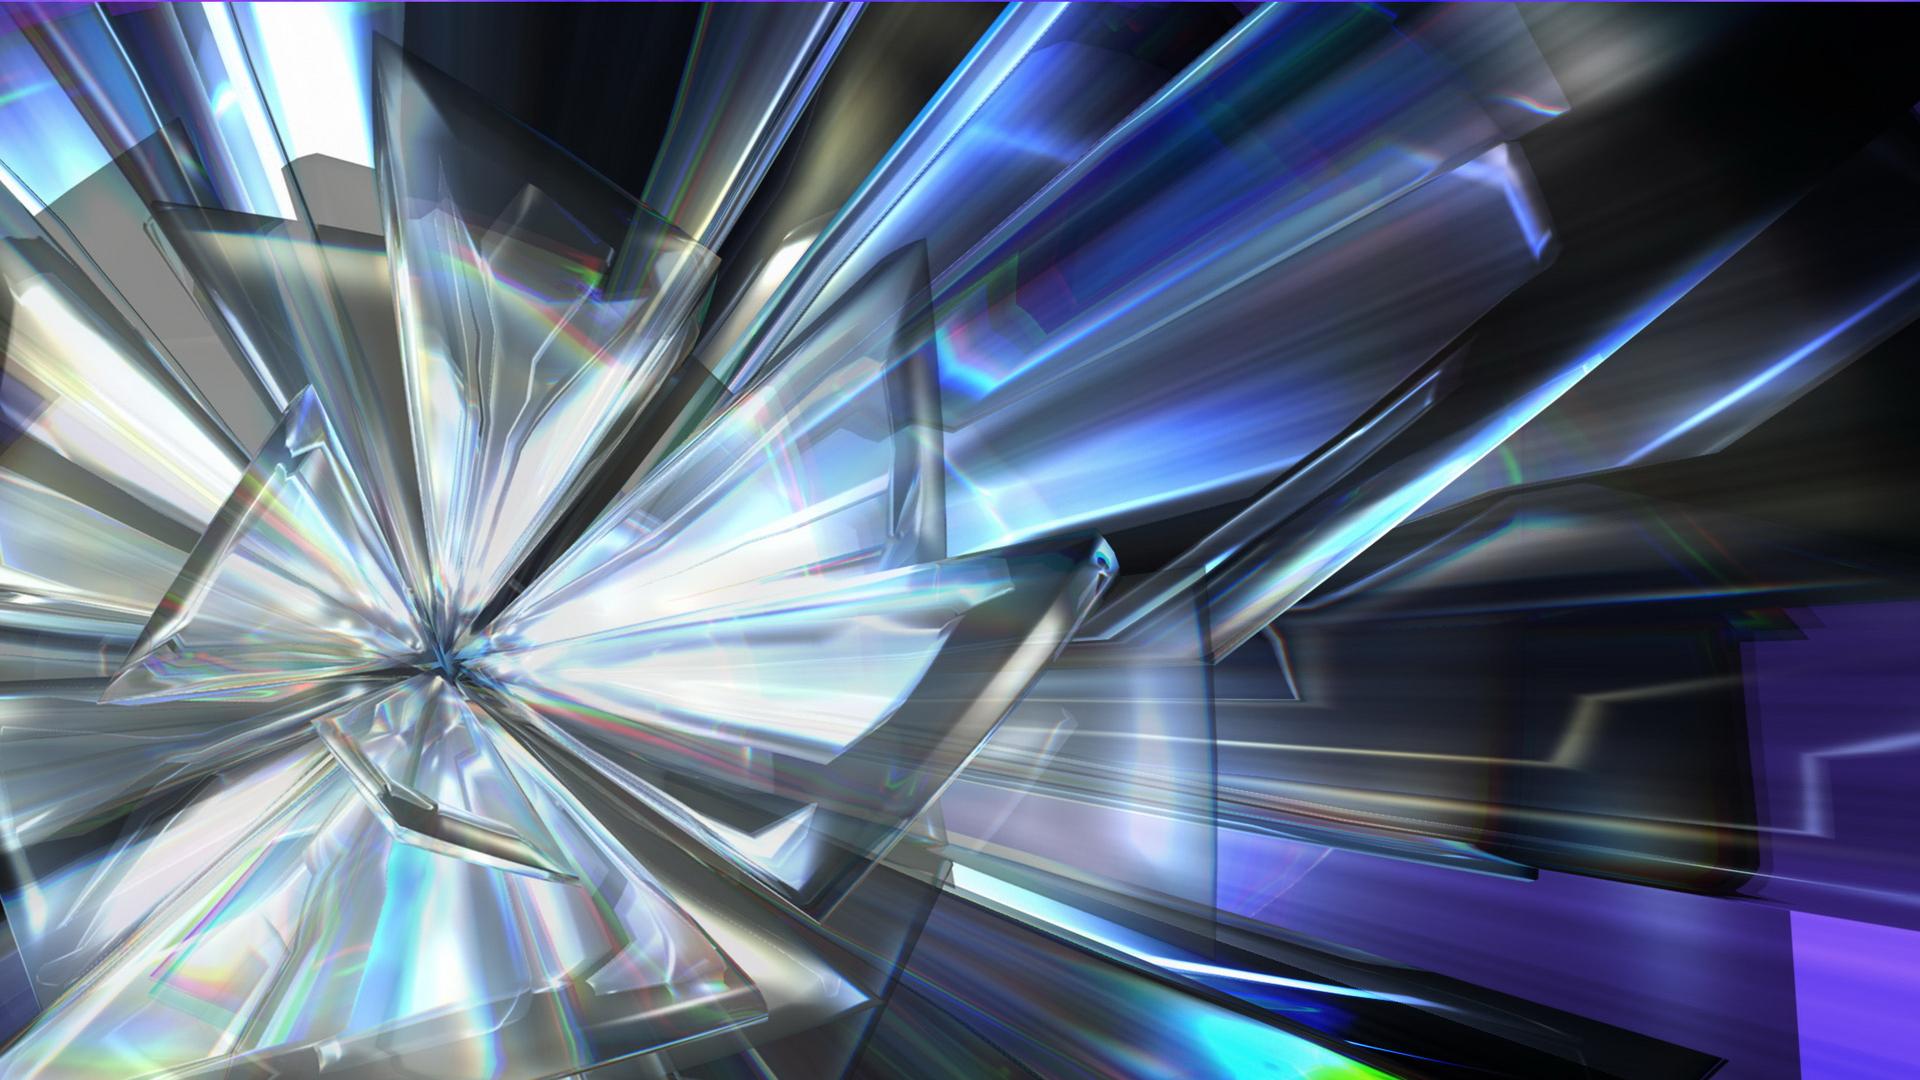 Crystal Wallpaper; Crystal Wallpaper; Crystal Wallpaper ...